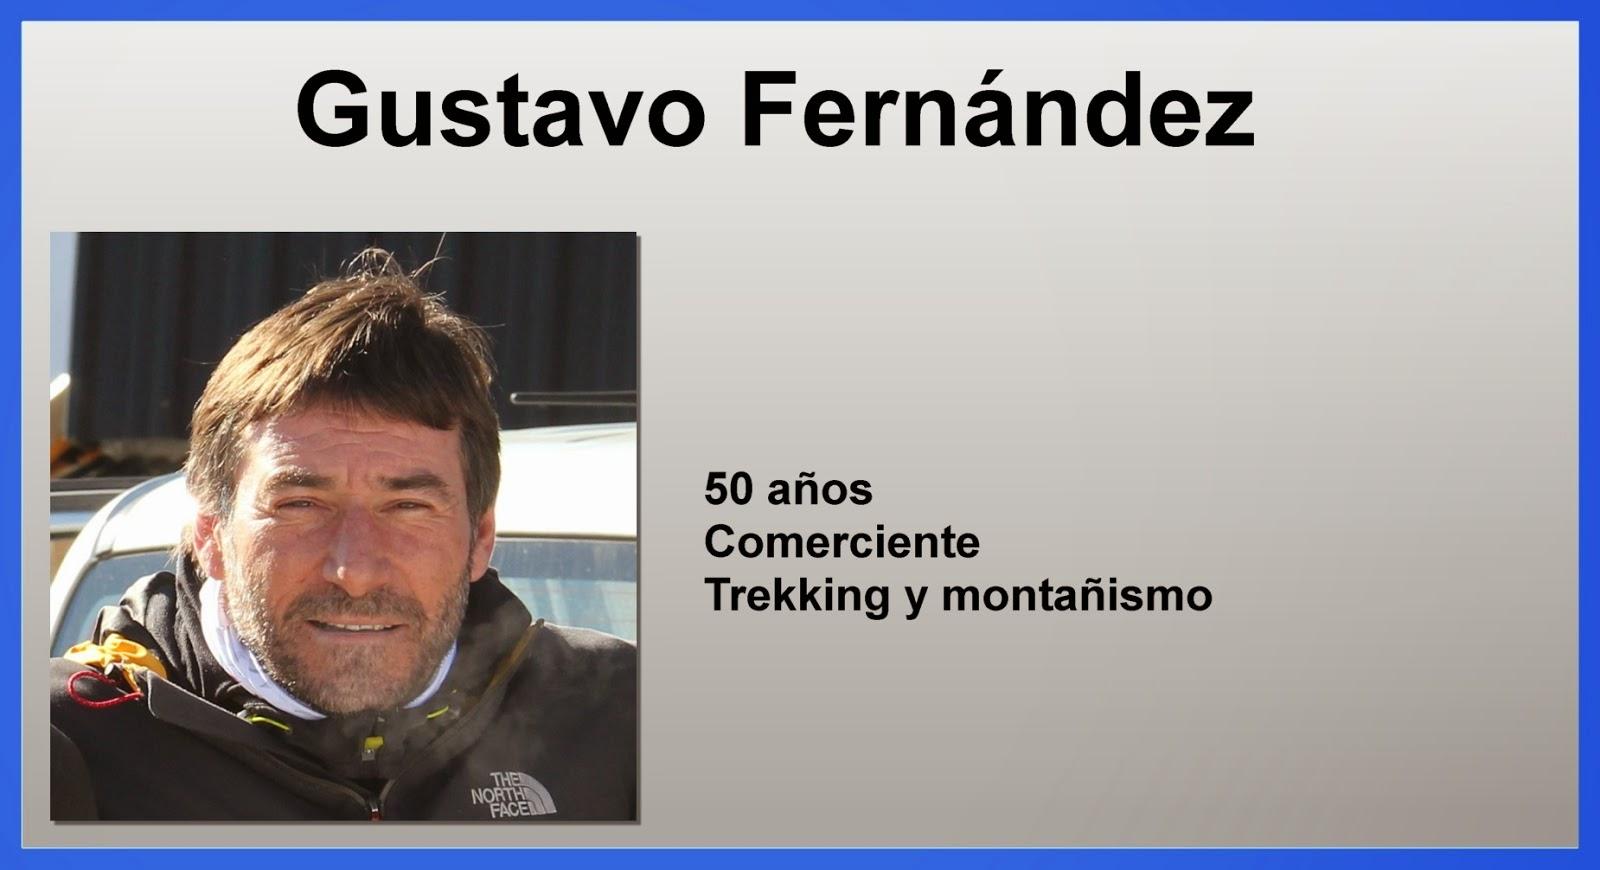 https://www.facebook.com/gustavo.fernandez.779205?fref=ts